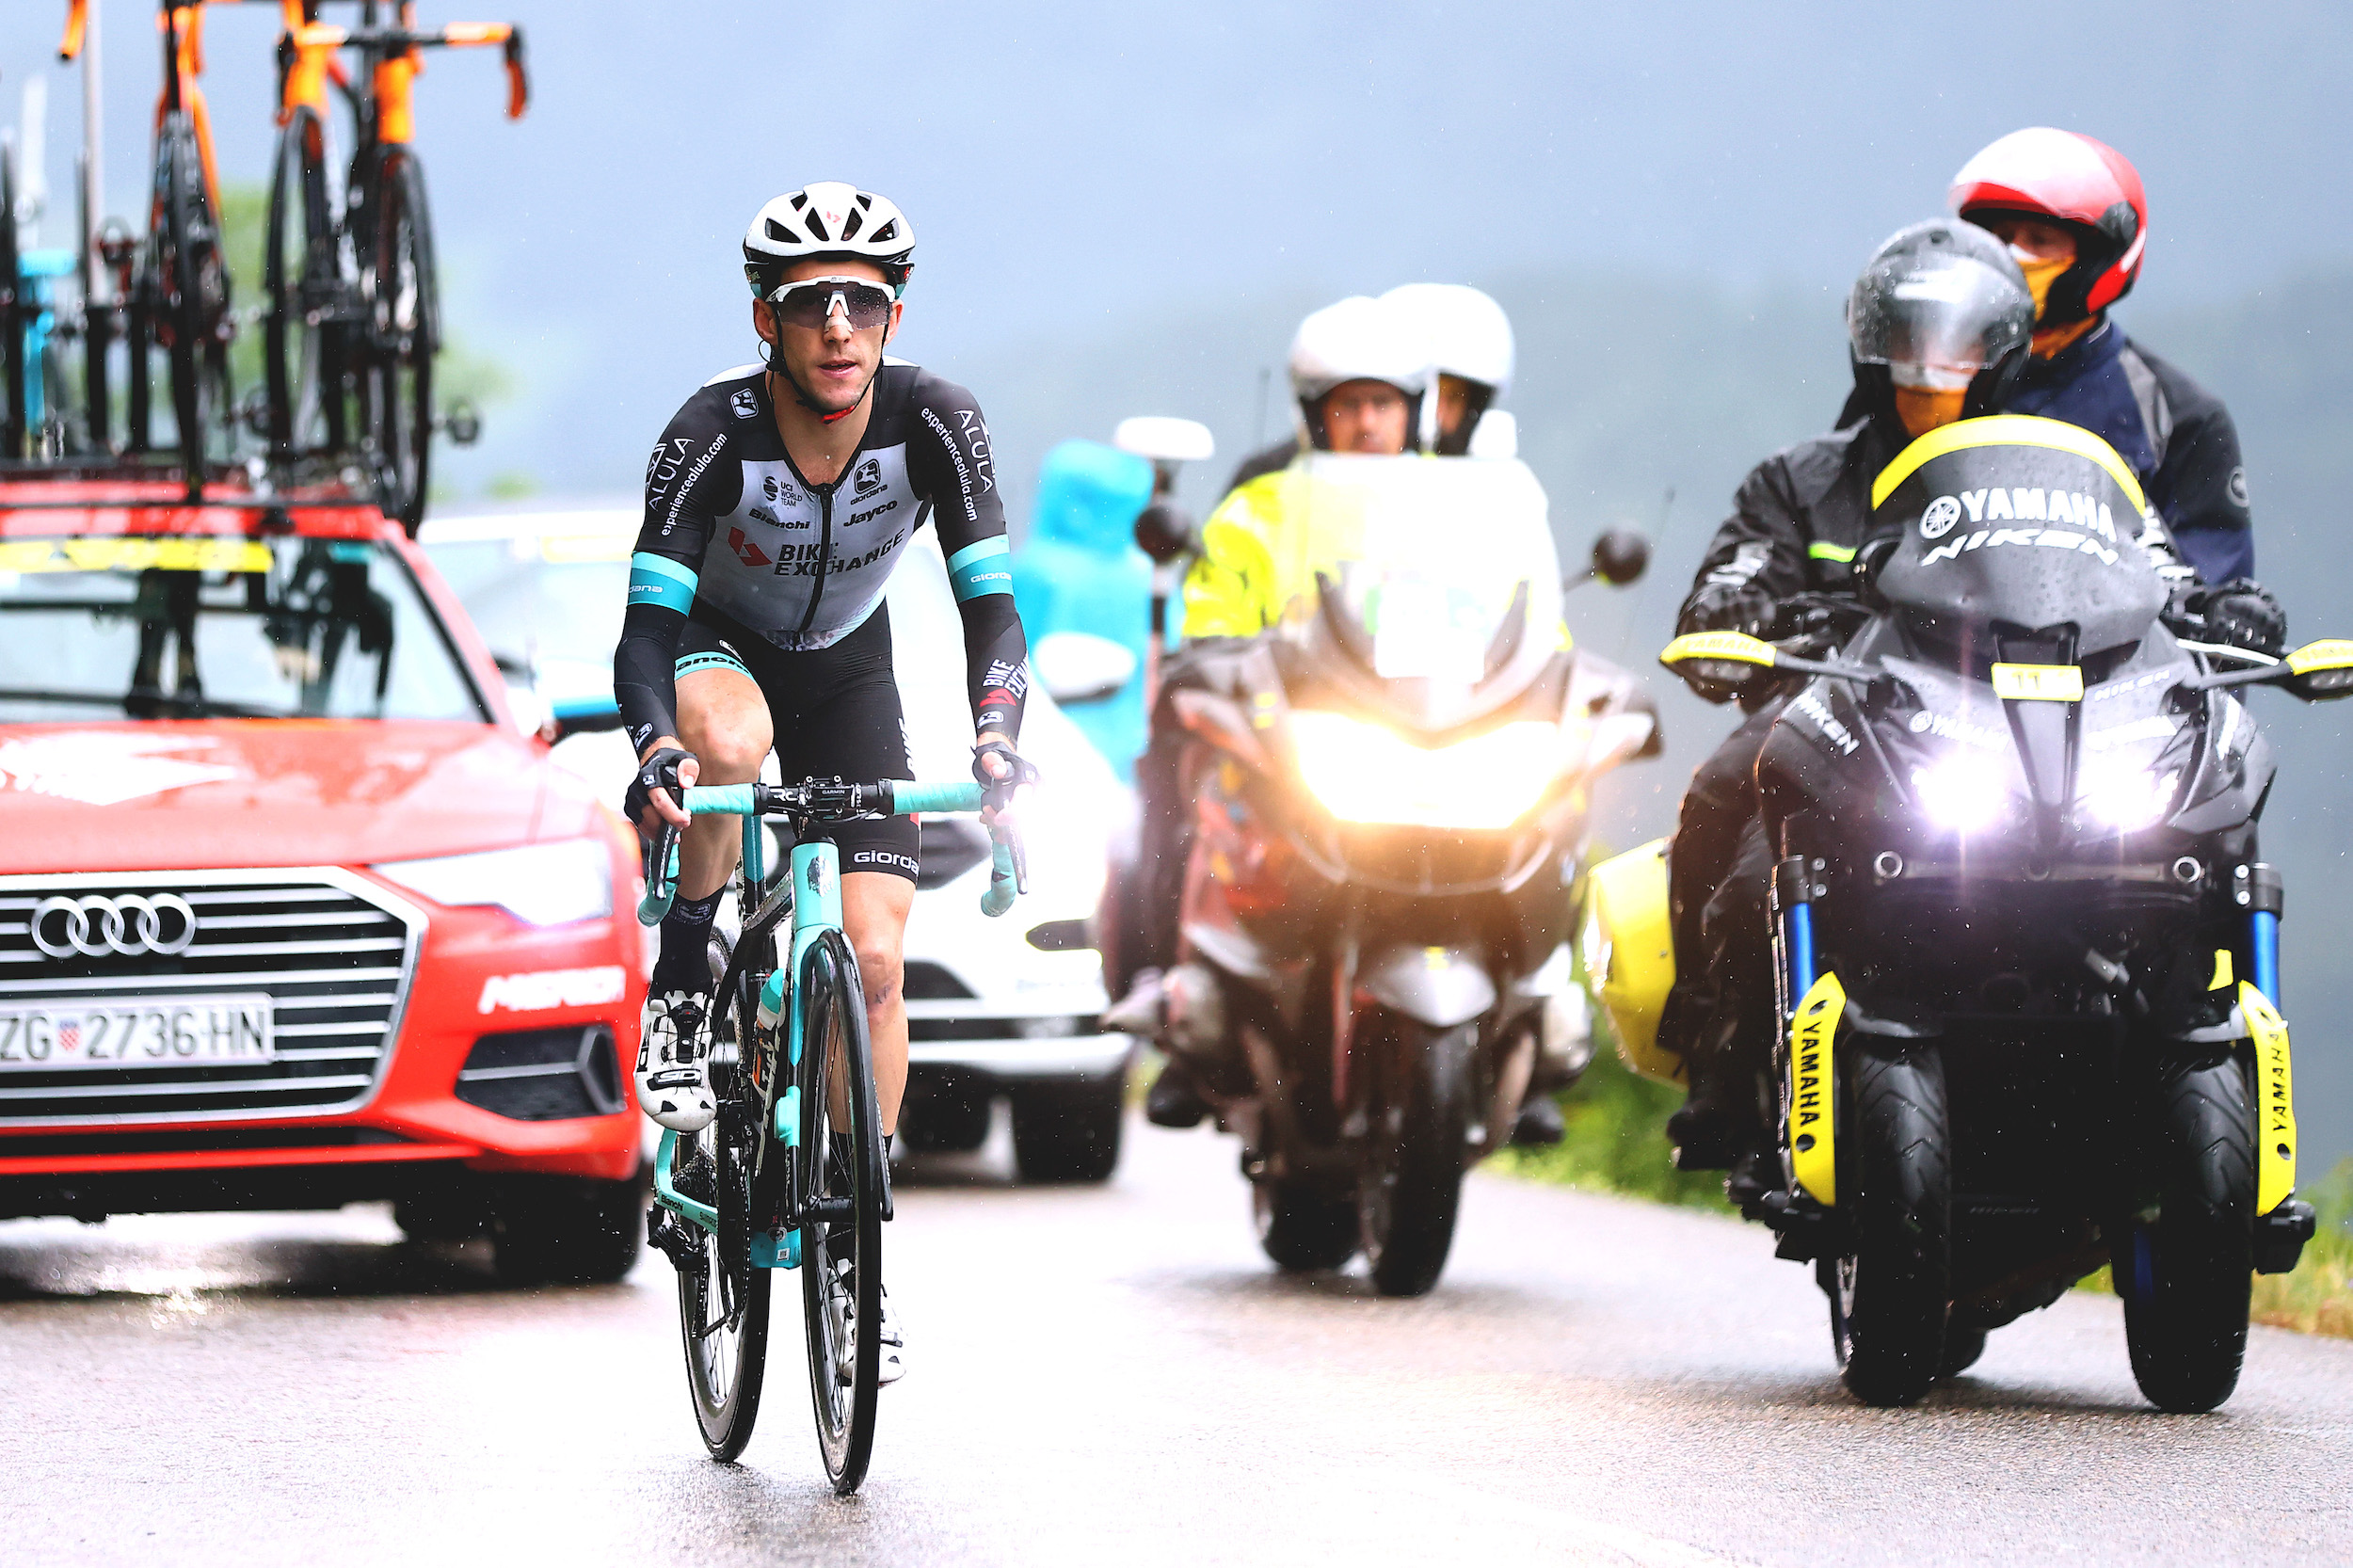 Simon Yates riding at the Tour de France 2021